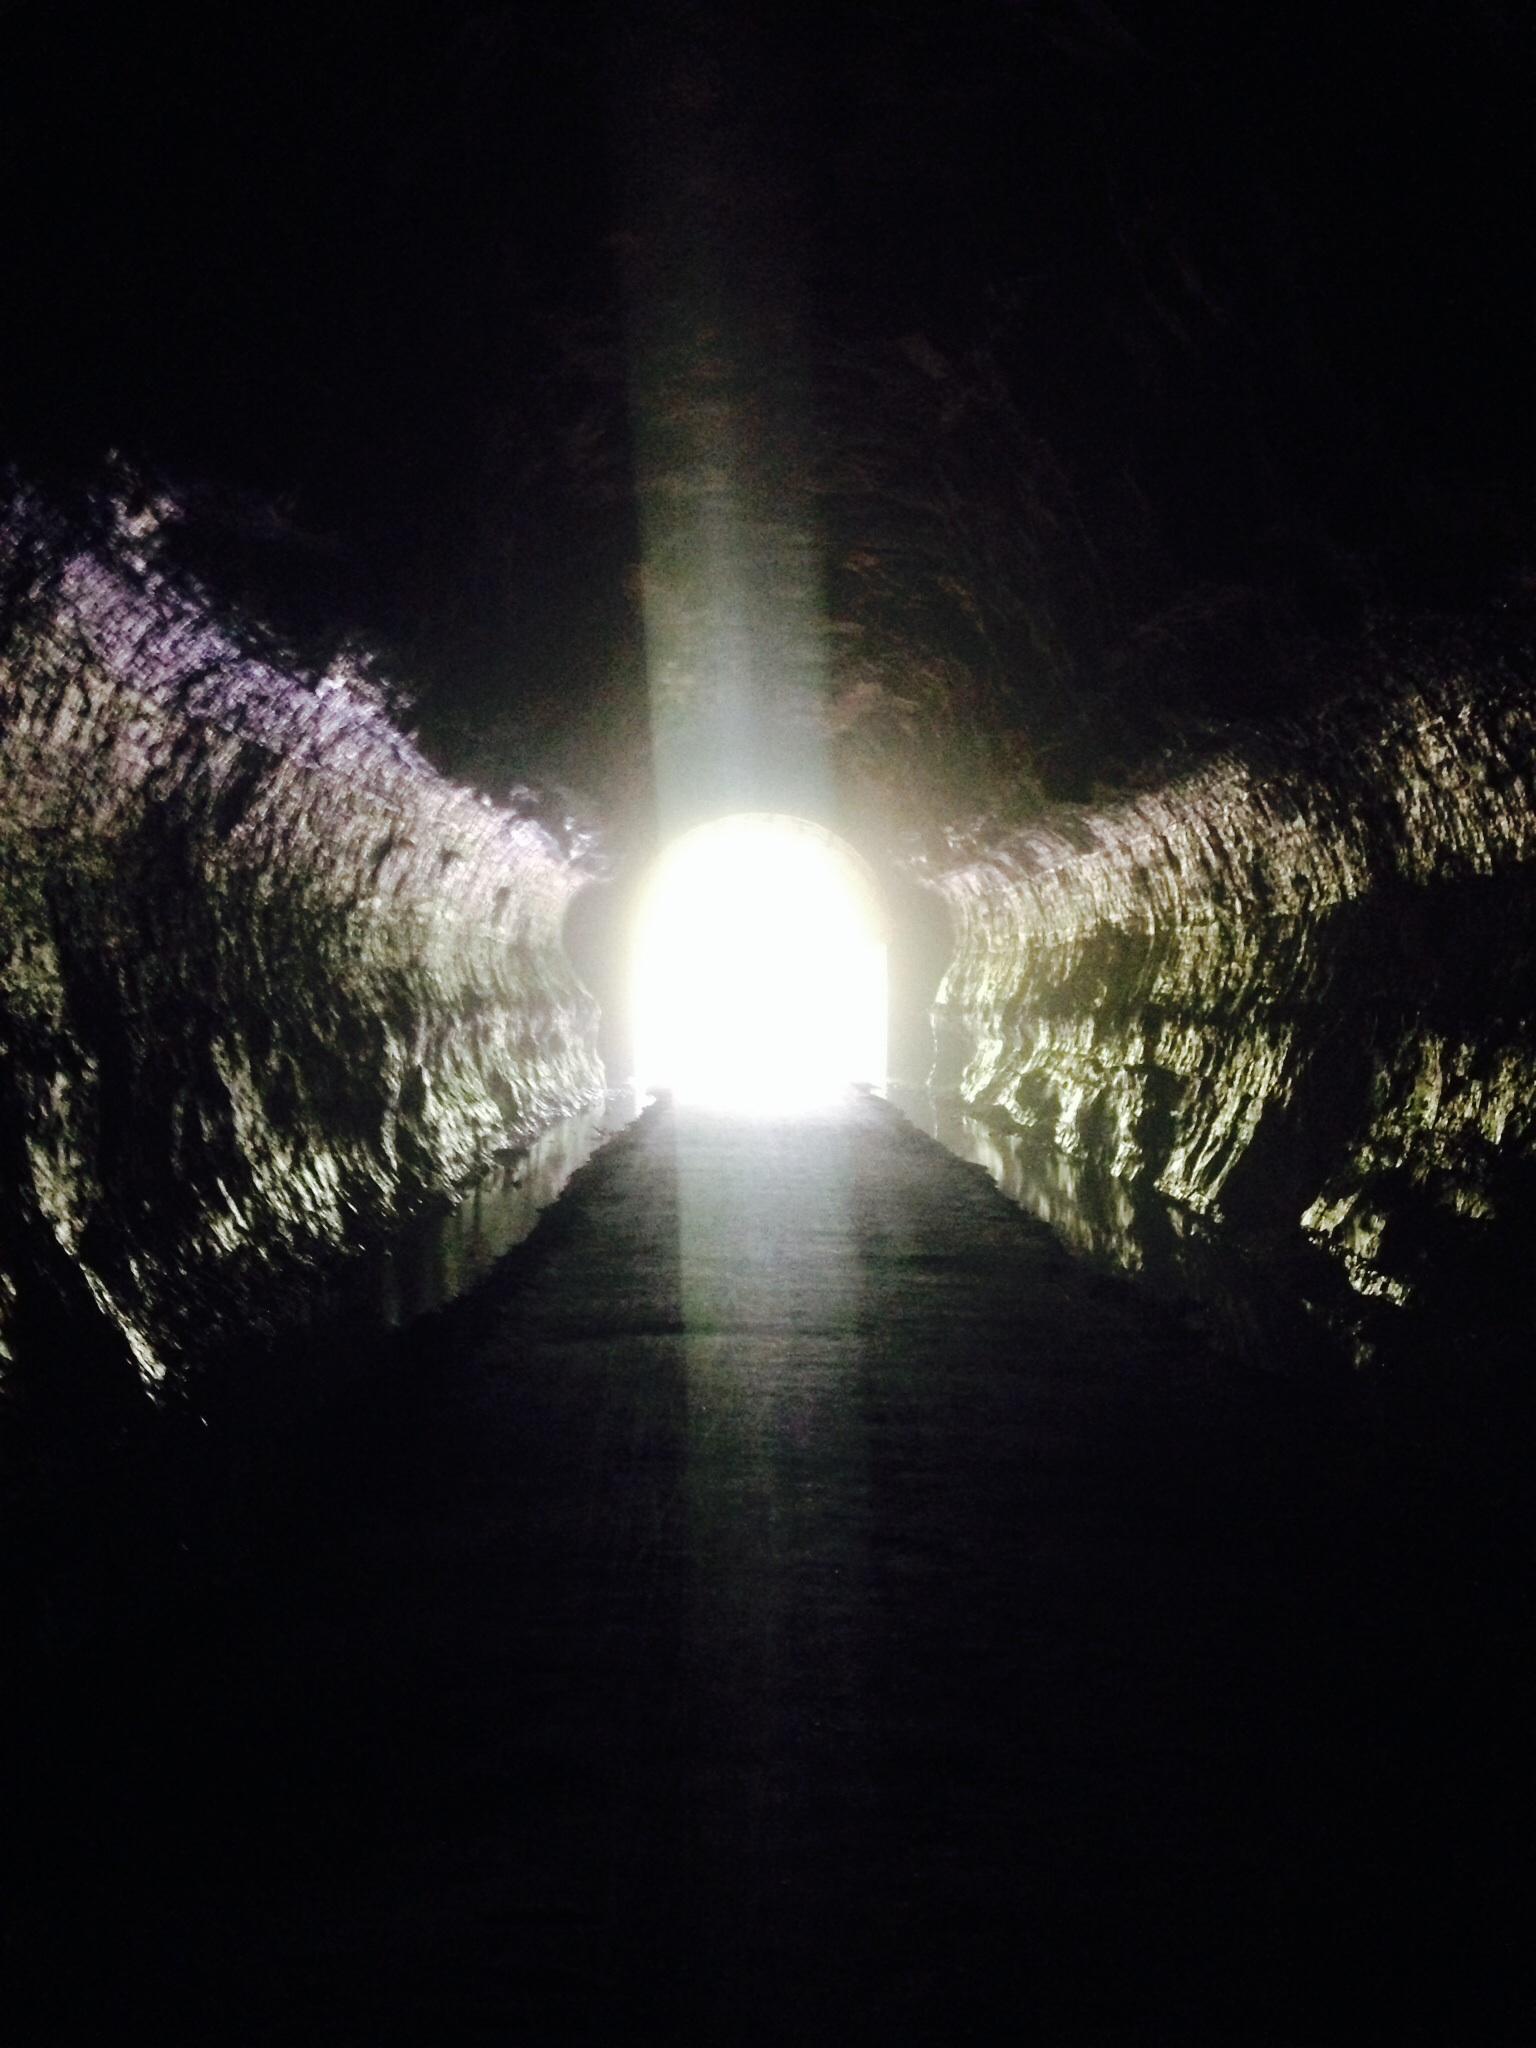 Walk toward the light!